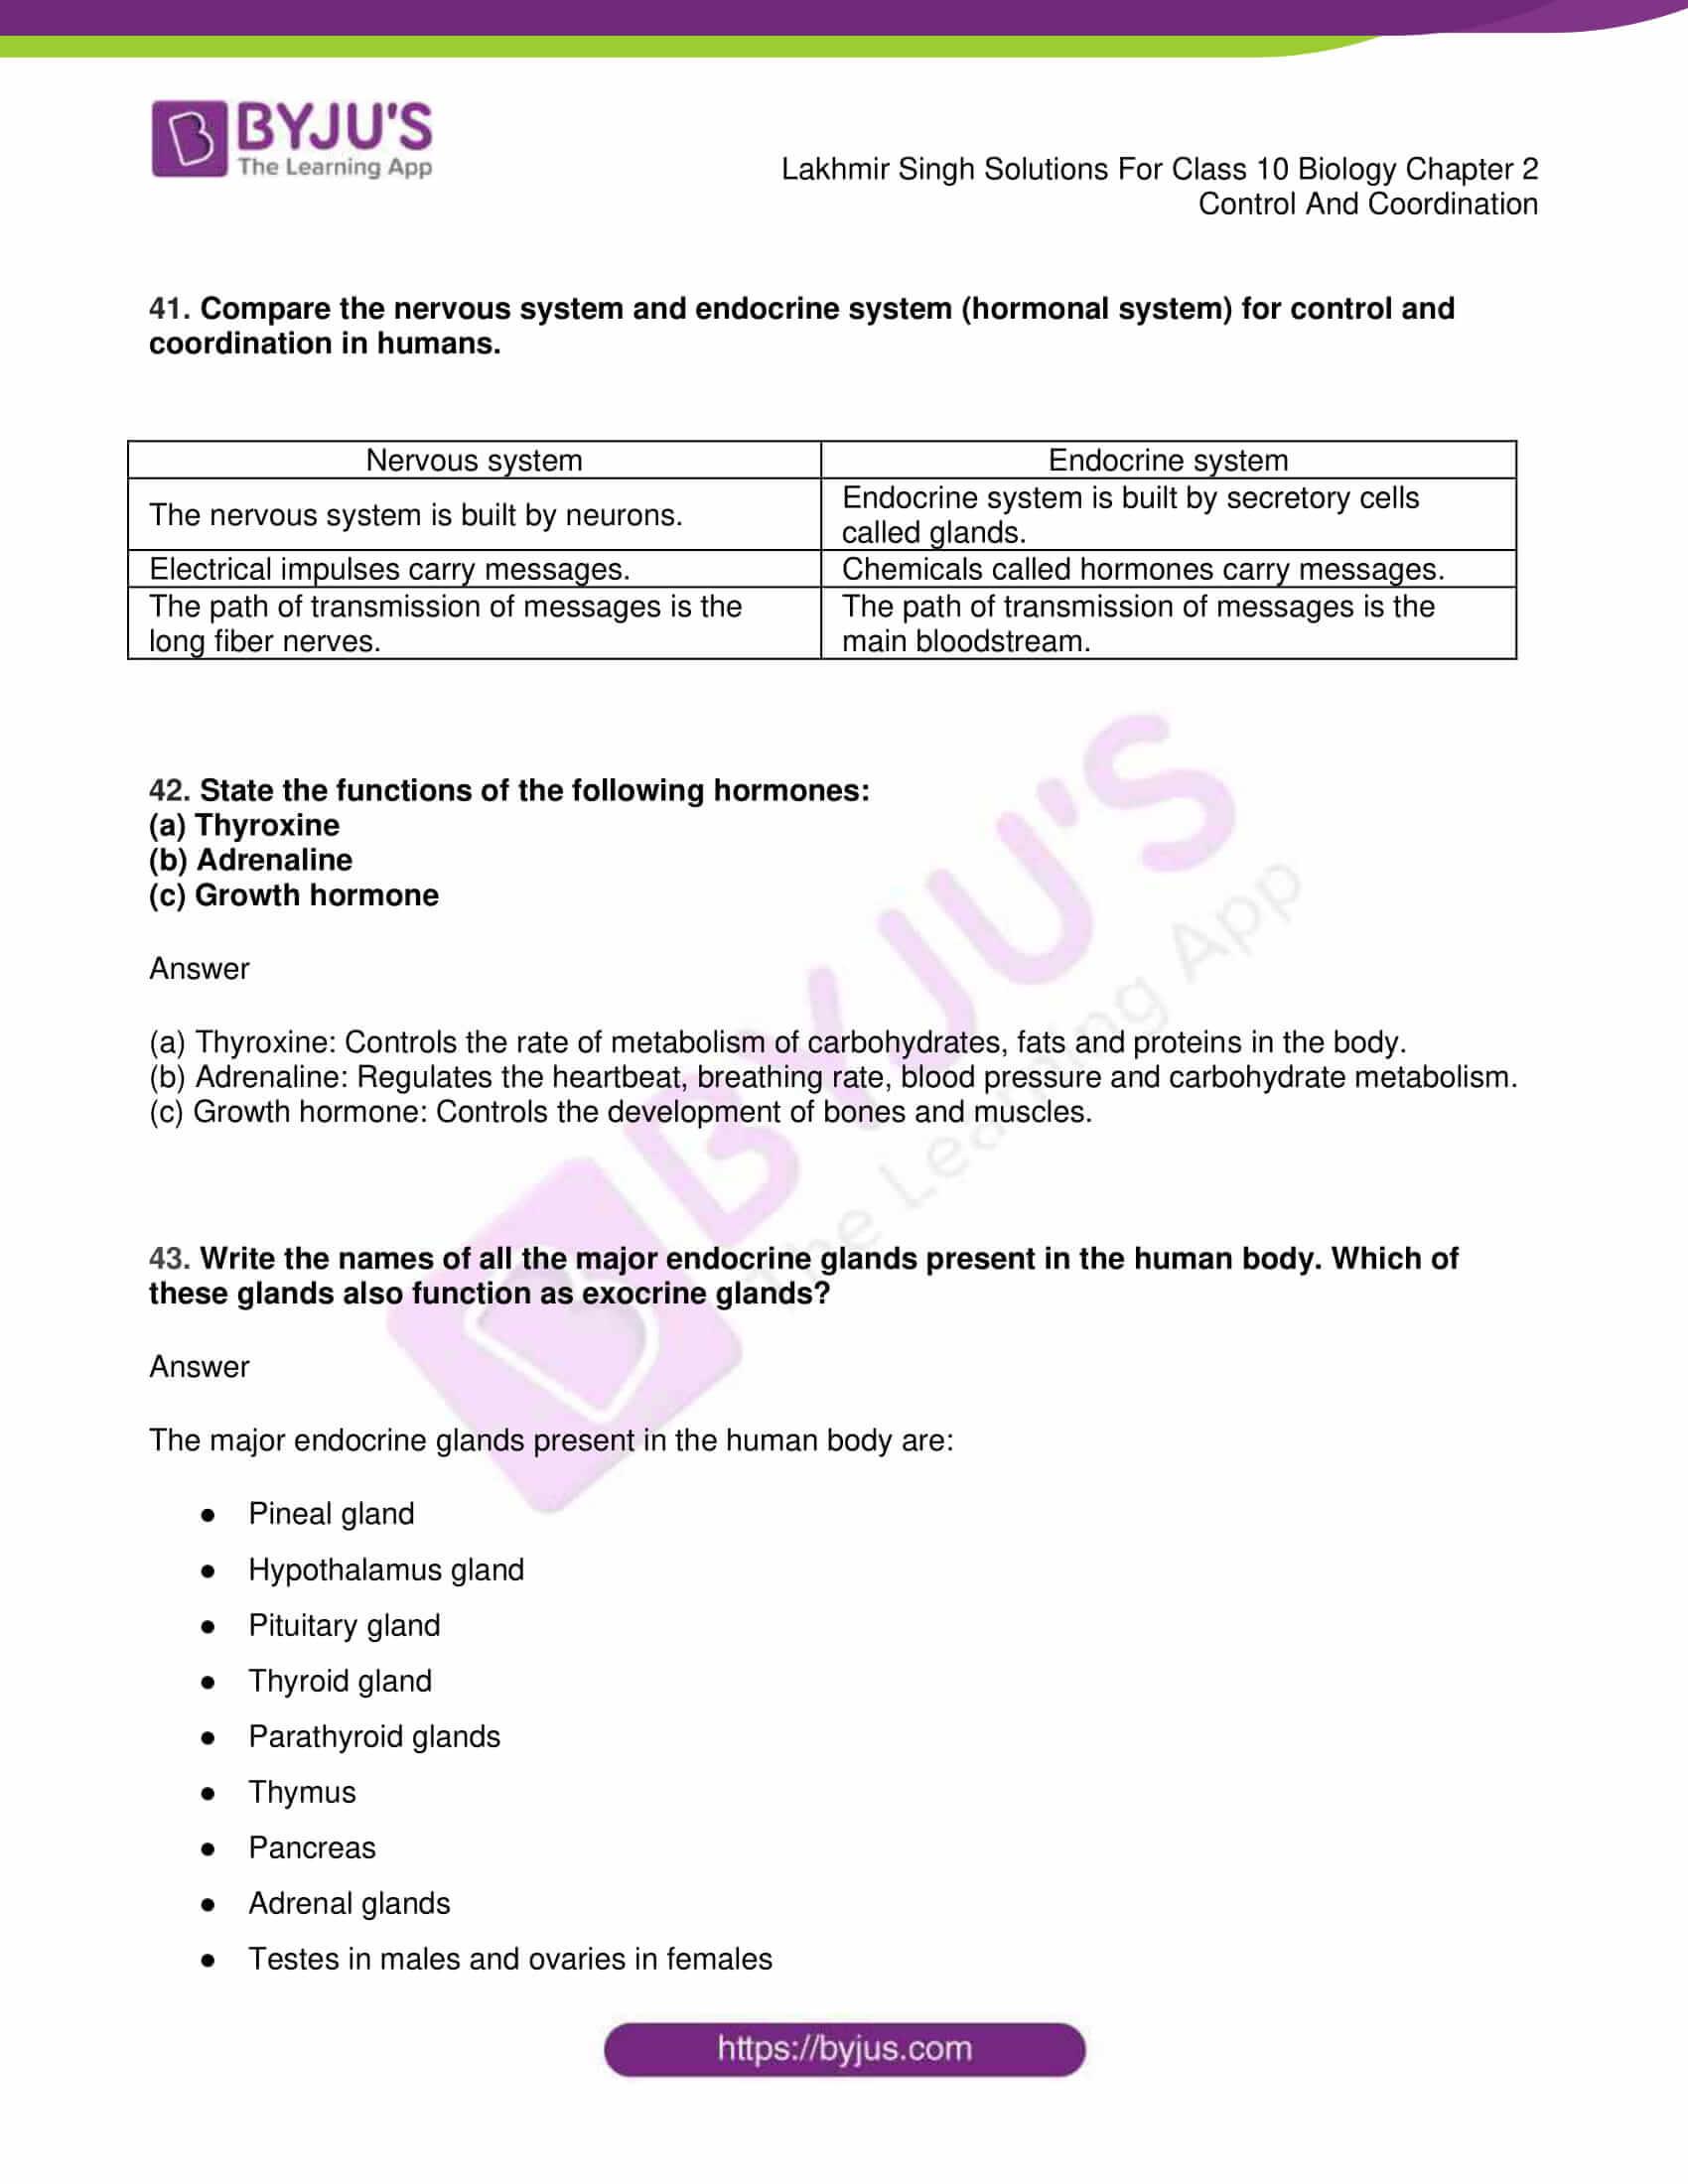 lakhmir singh sol class 10 biology chapter 2 32